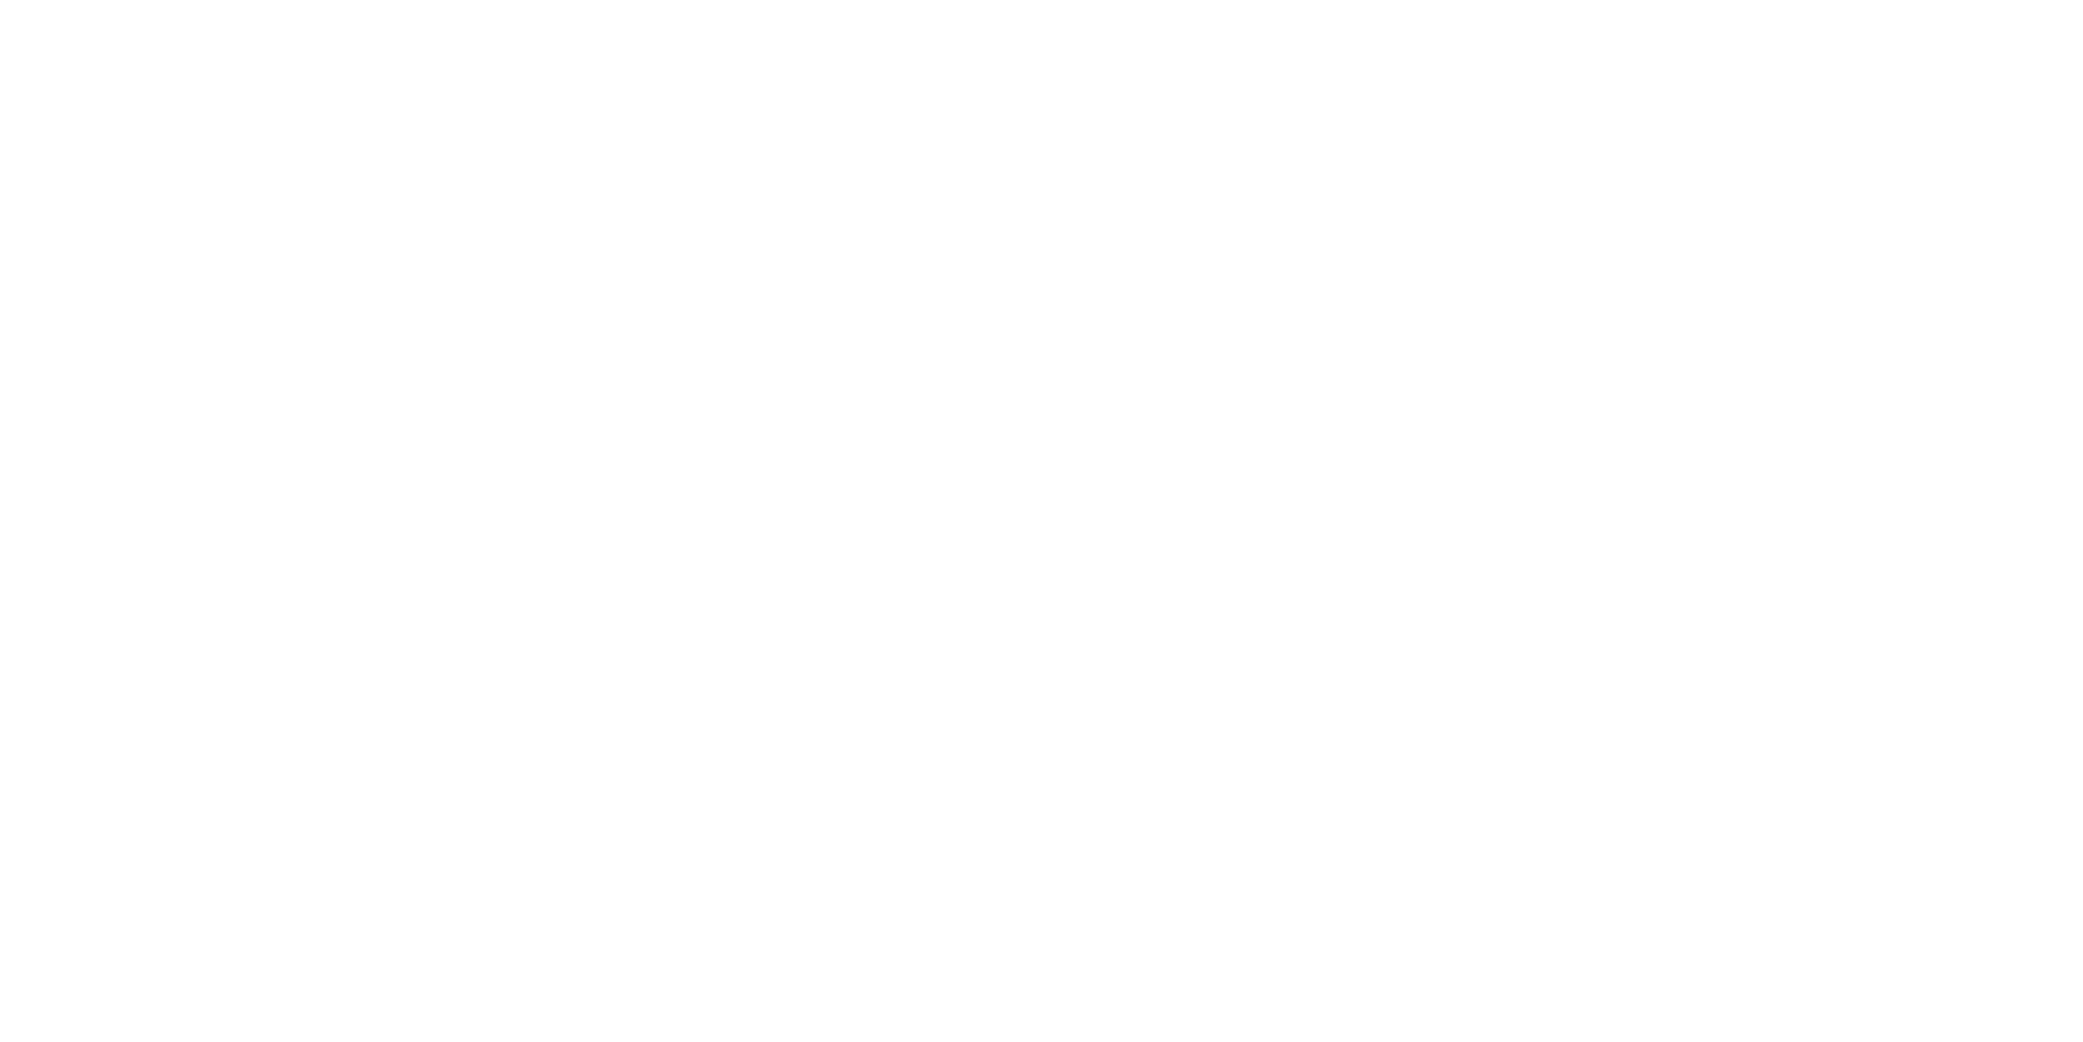 Diakonische Wohnstätten Friedland